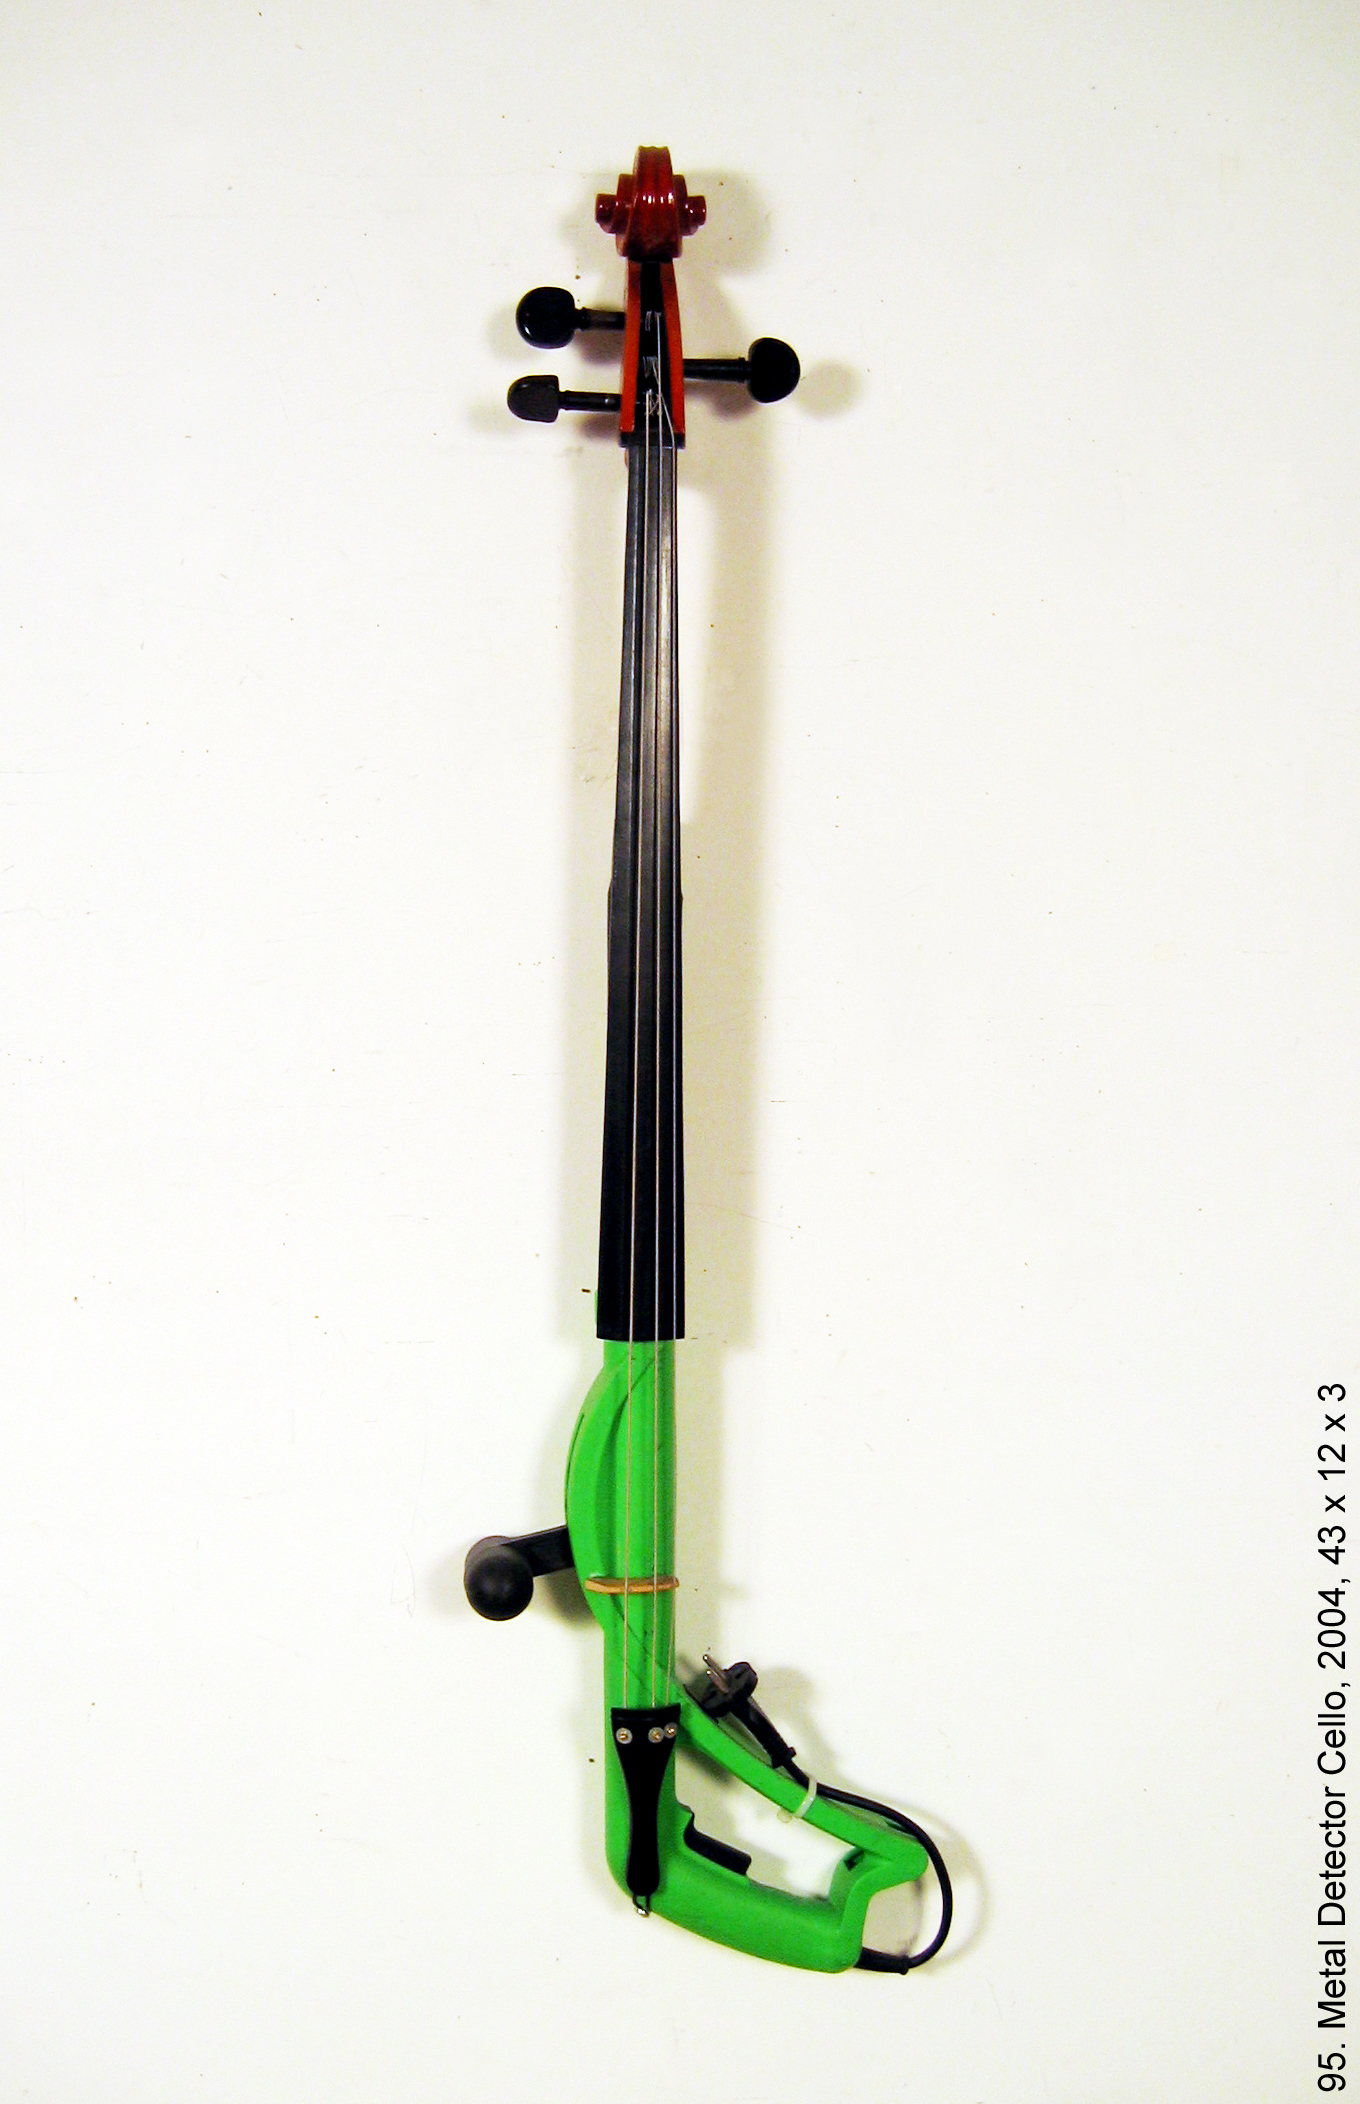 95 Metal Detector Cello wt.jpg